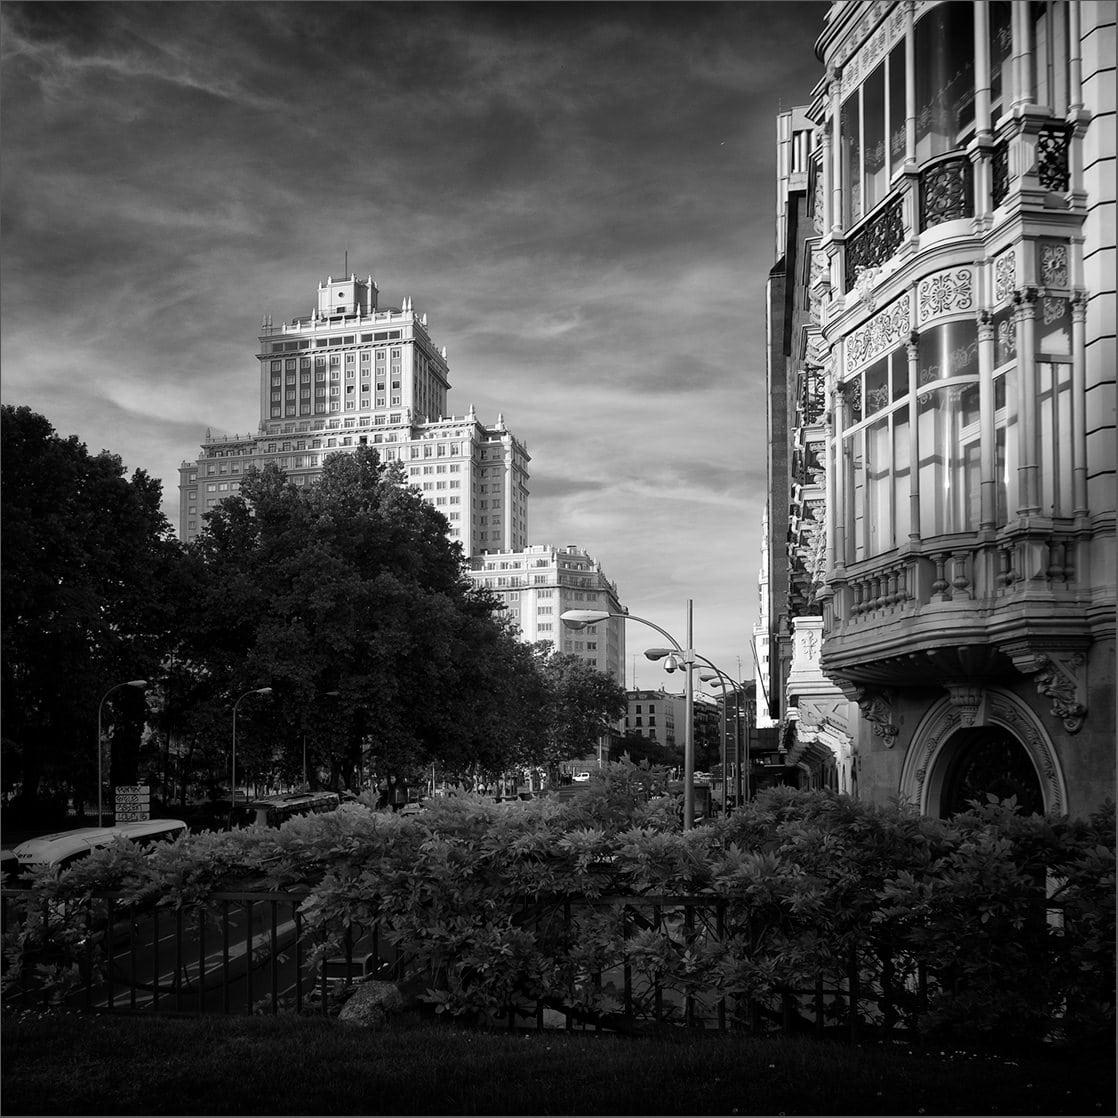 """Clásicos urbanos"" por Gabriel Blázquez. Fuji X-T2 + XF 10-24mm F4."